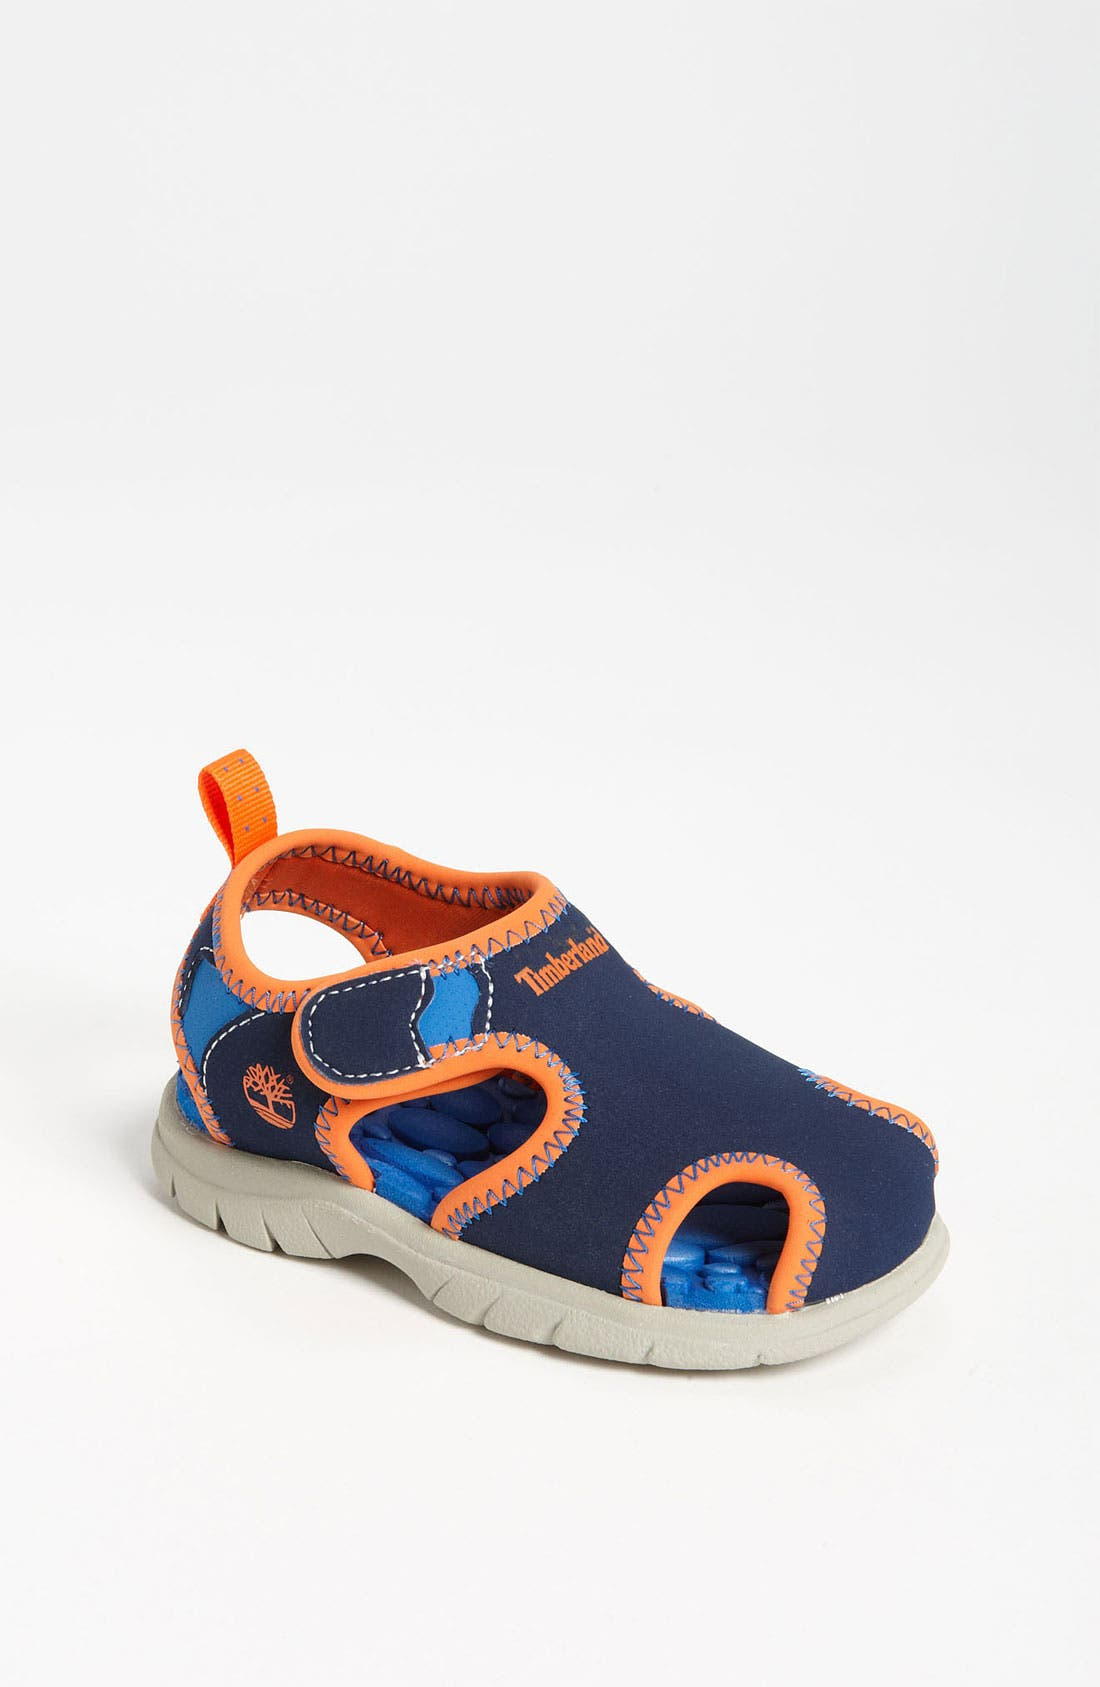 'Little Harbor' Sandal,                         Main,                         color, Navy/ Orange